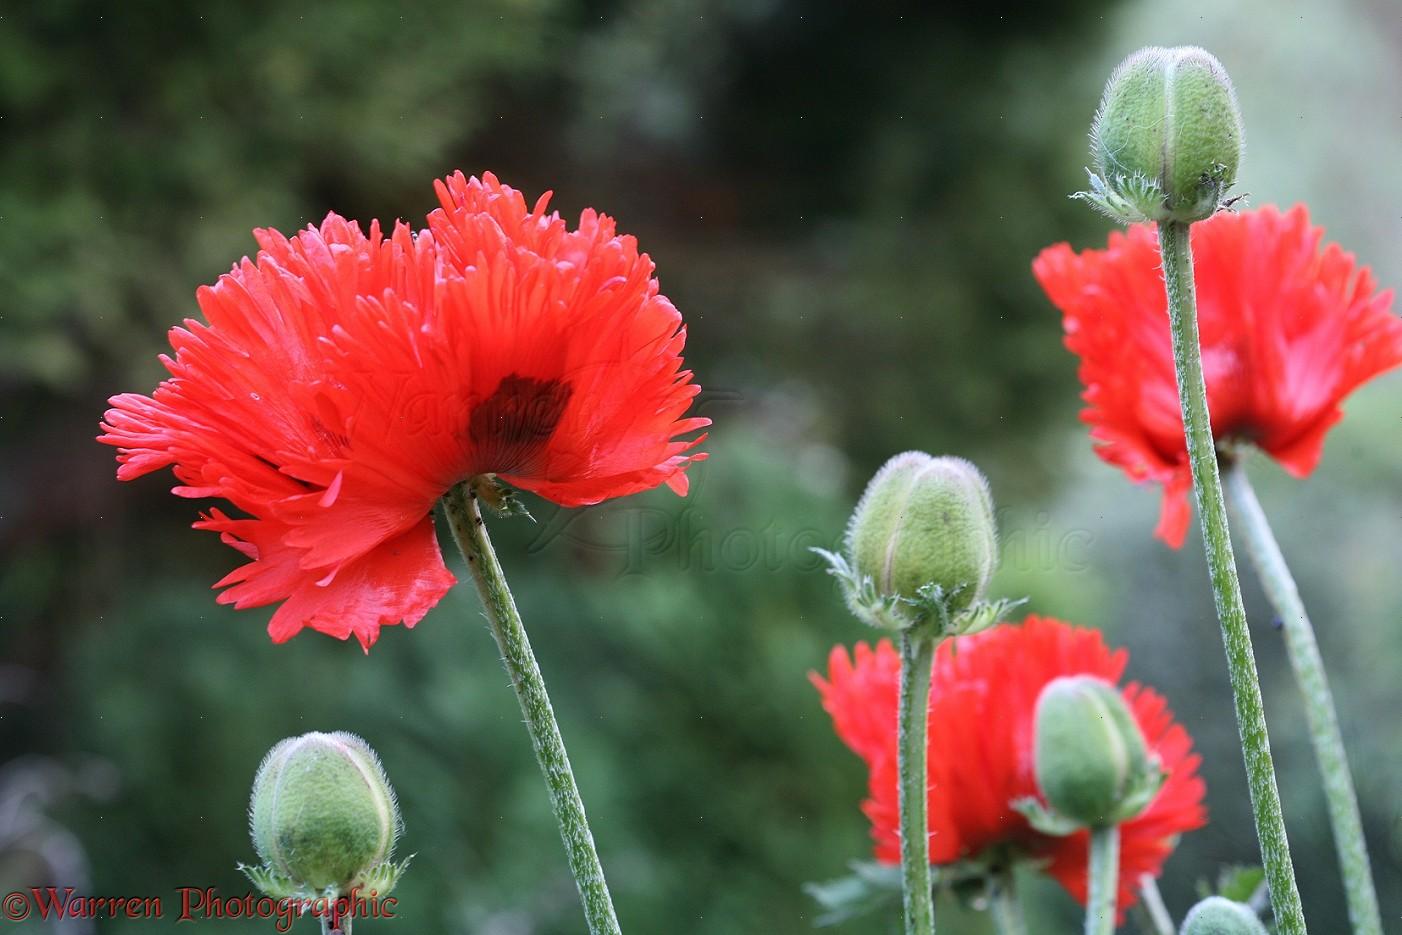 Red oriental poppies photo wp33964 red oriental poppy papaver orientale flowers mightylinksfo